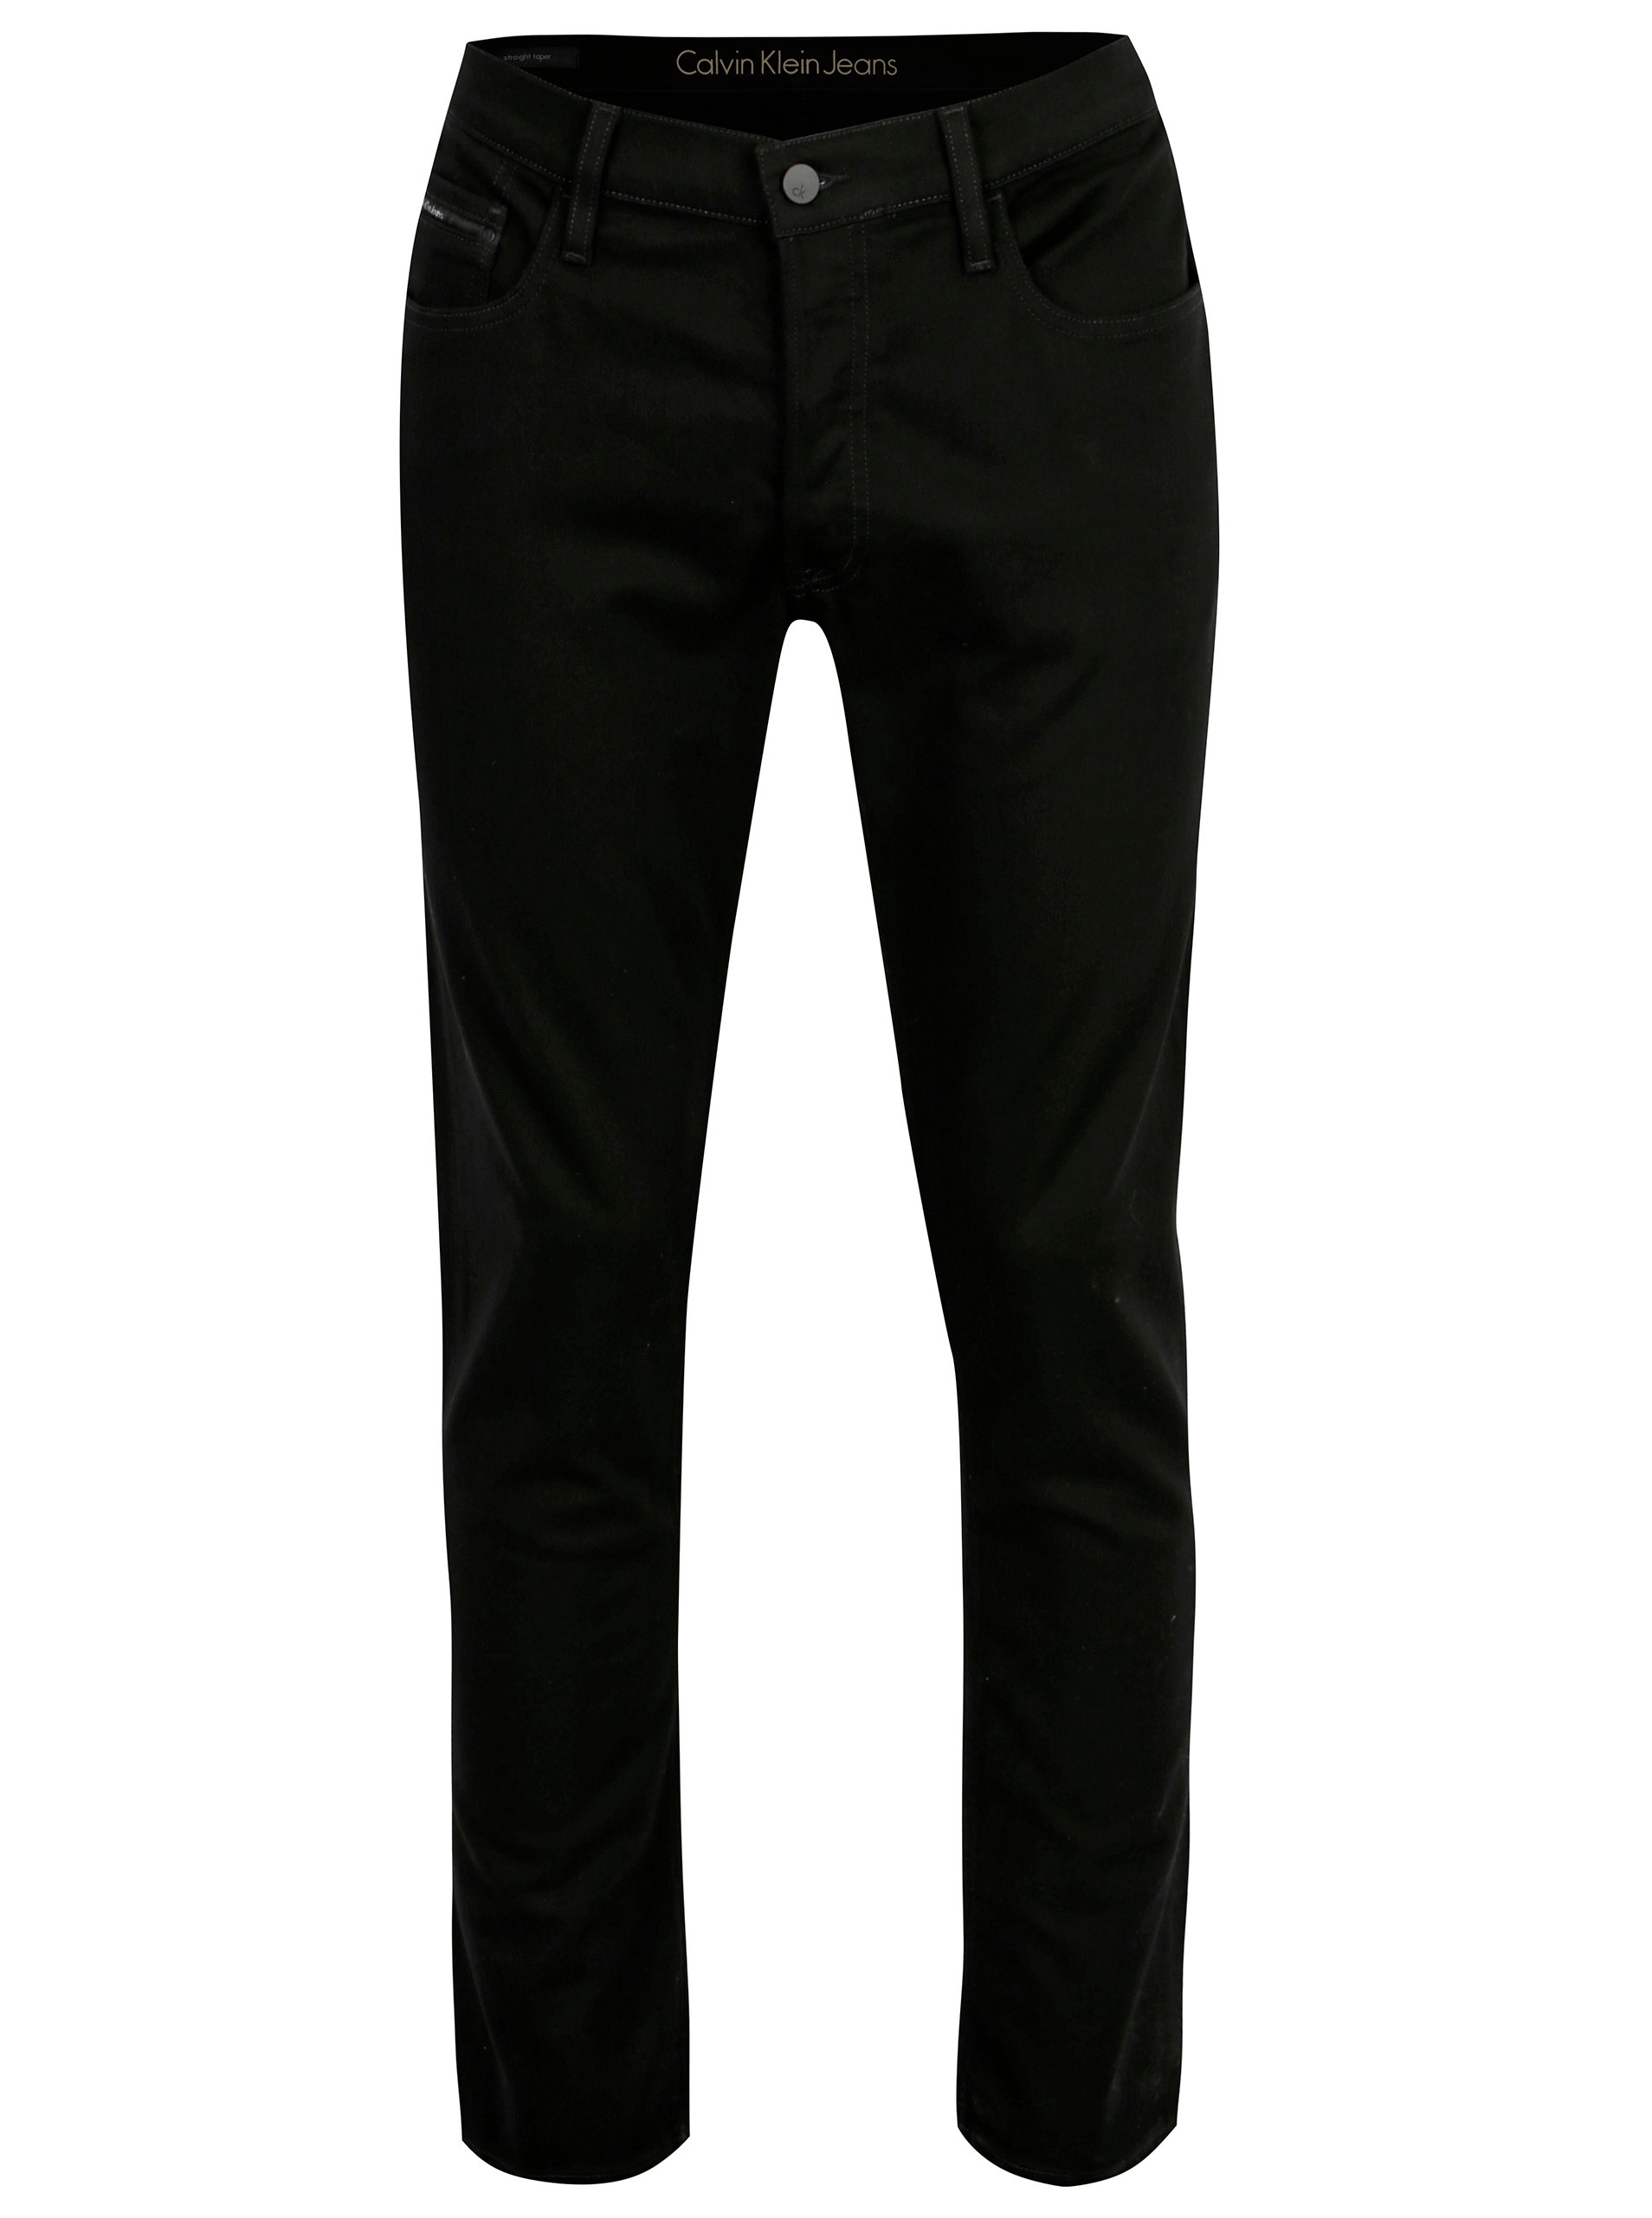 b0b1643fefb Černé pánské straight džíny Calvin Klein Jeans ...